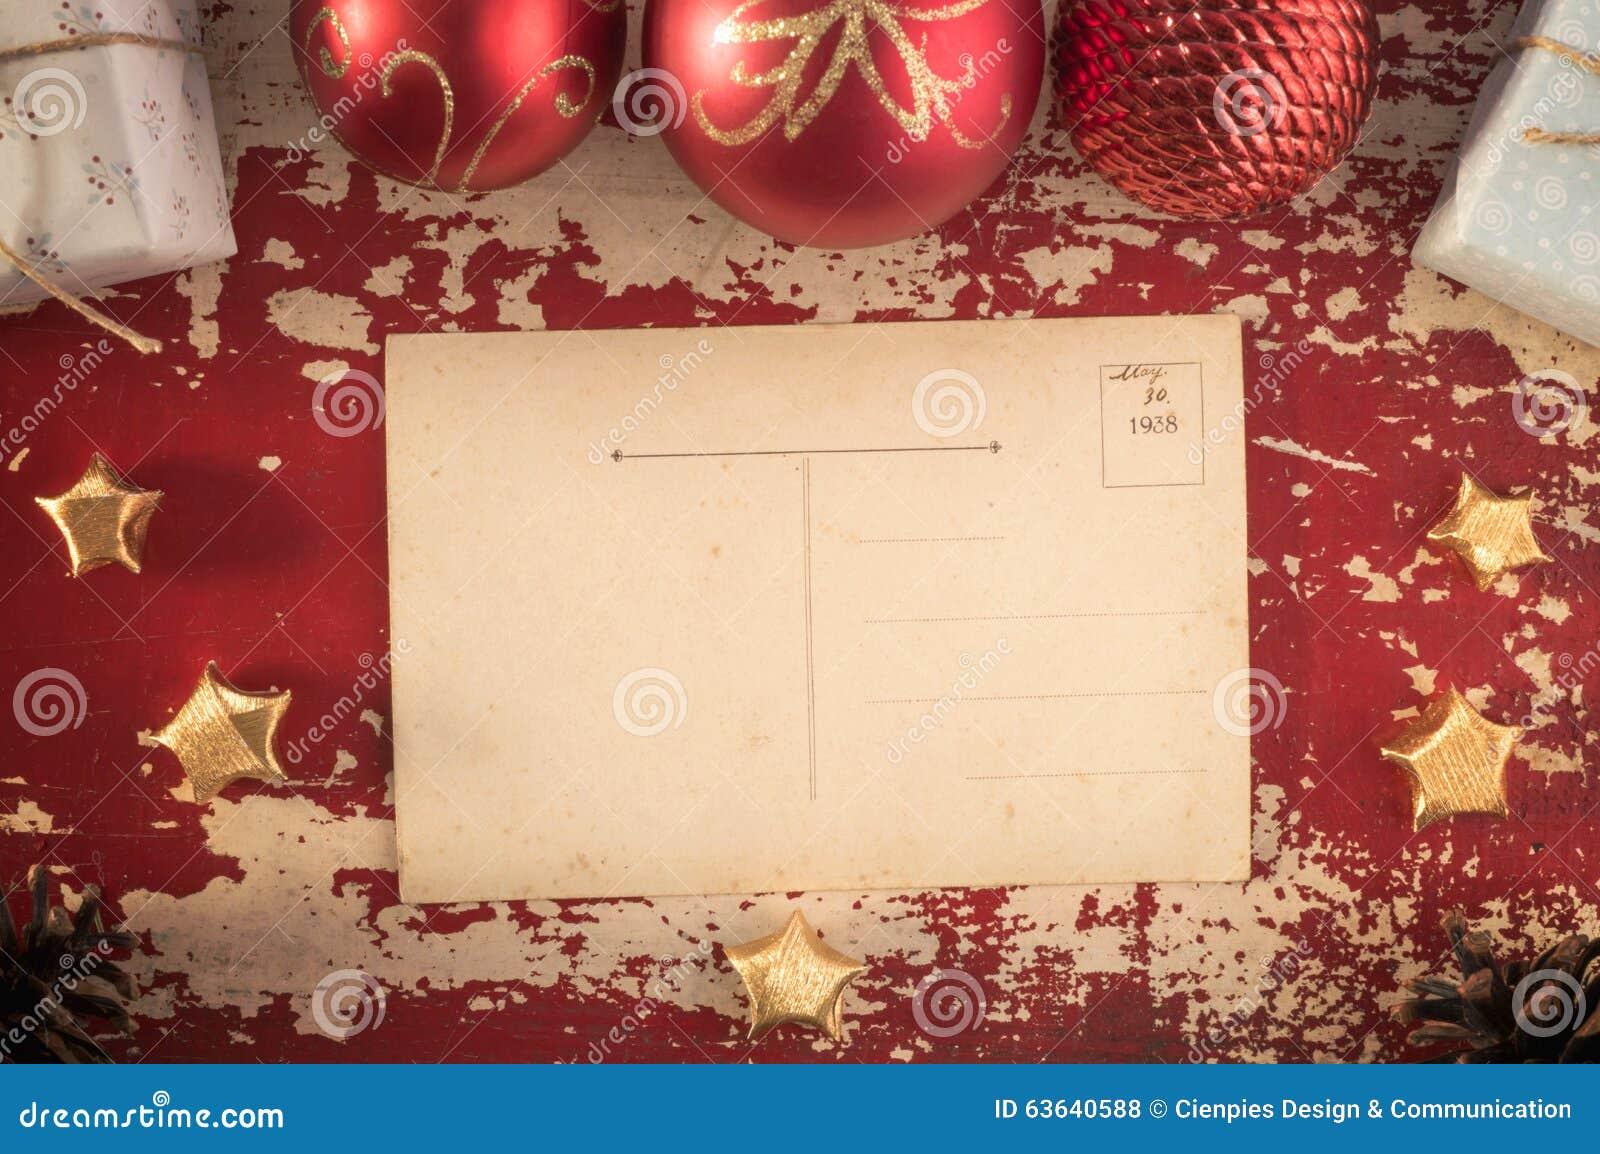 vintage merry christmas holiday postcard stock vector image merry christmas vintage hipster postcard template royalty stock photos